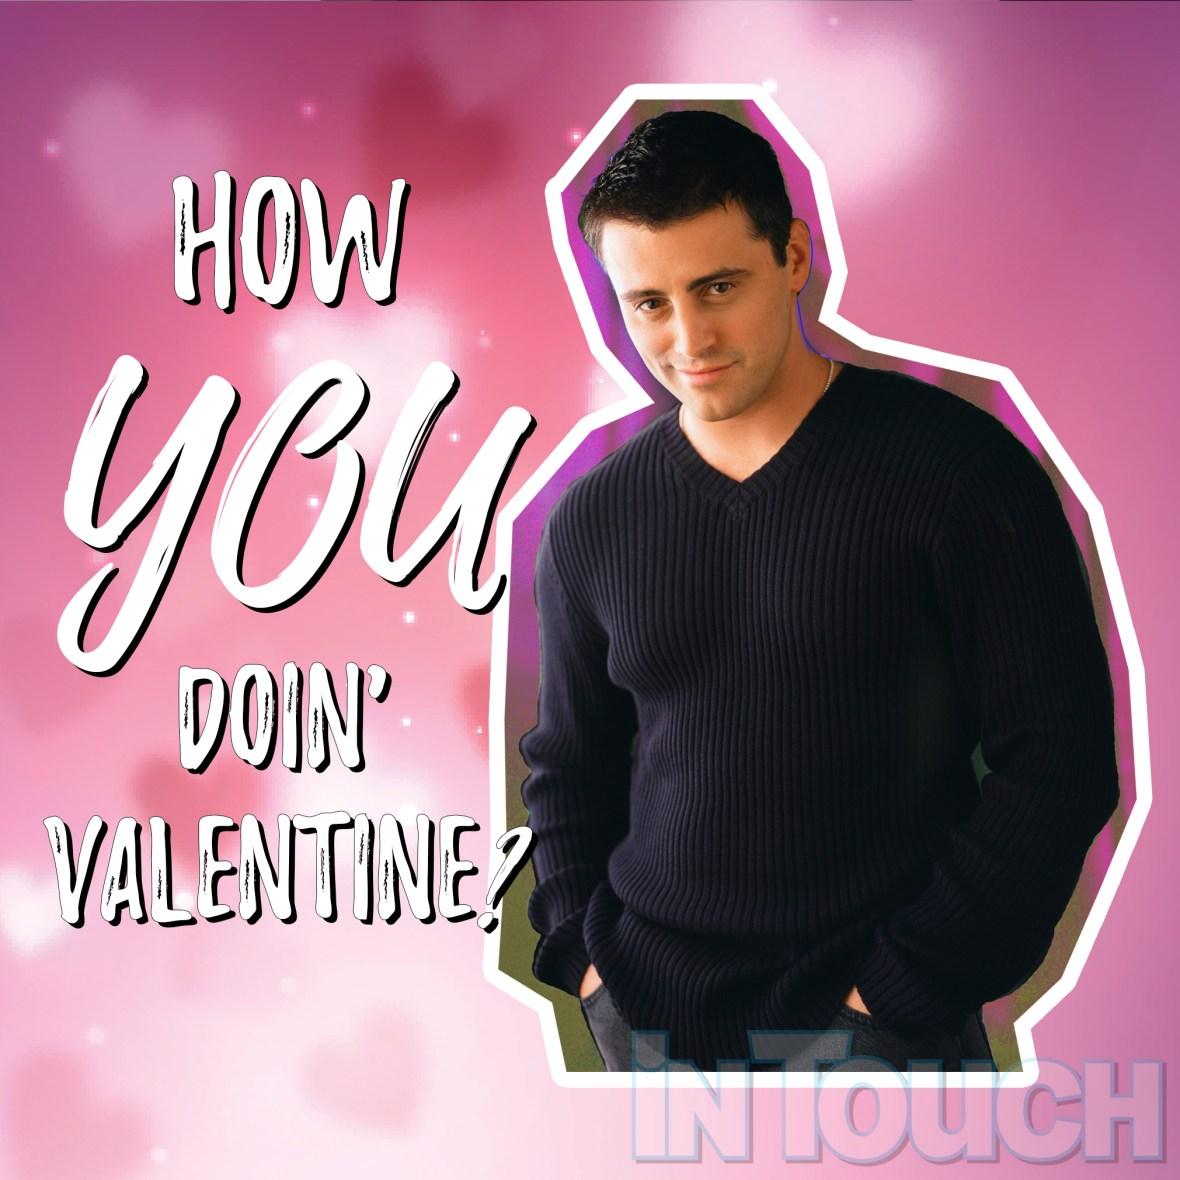 friends valentine's day card 9